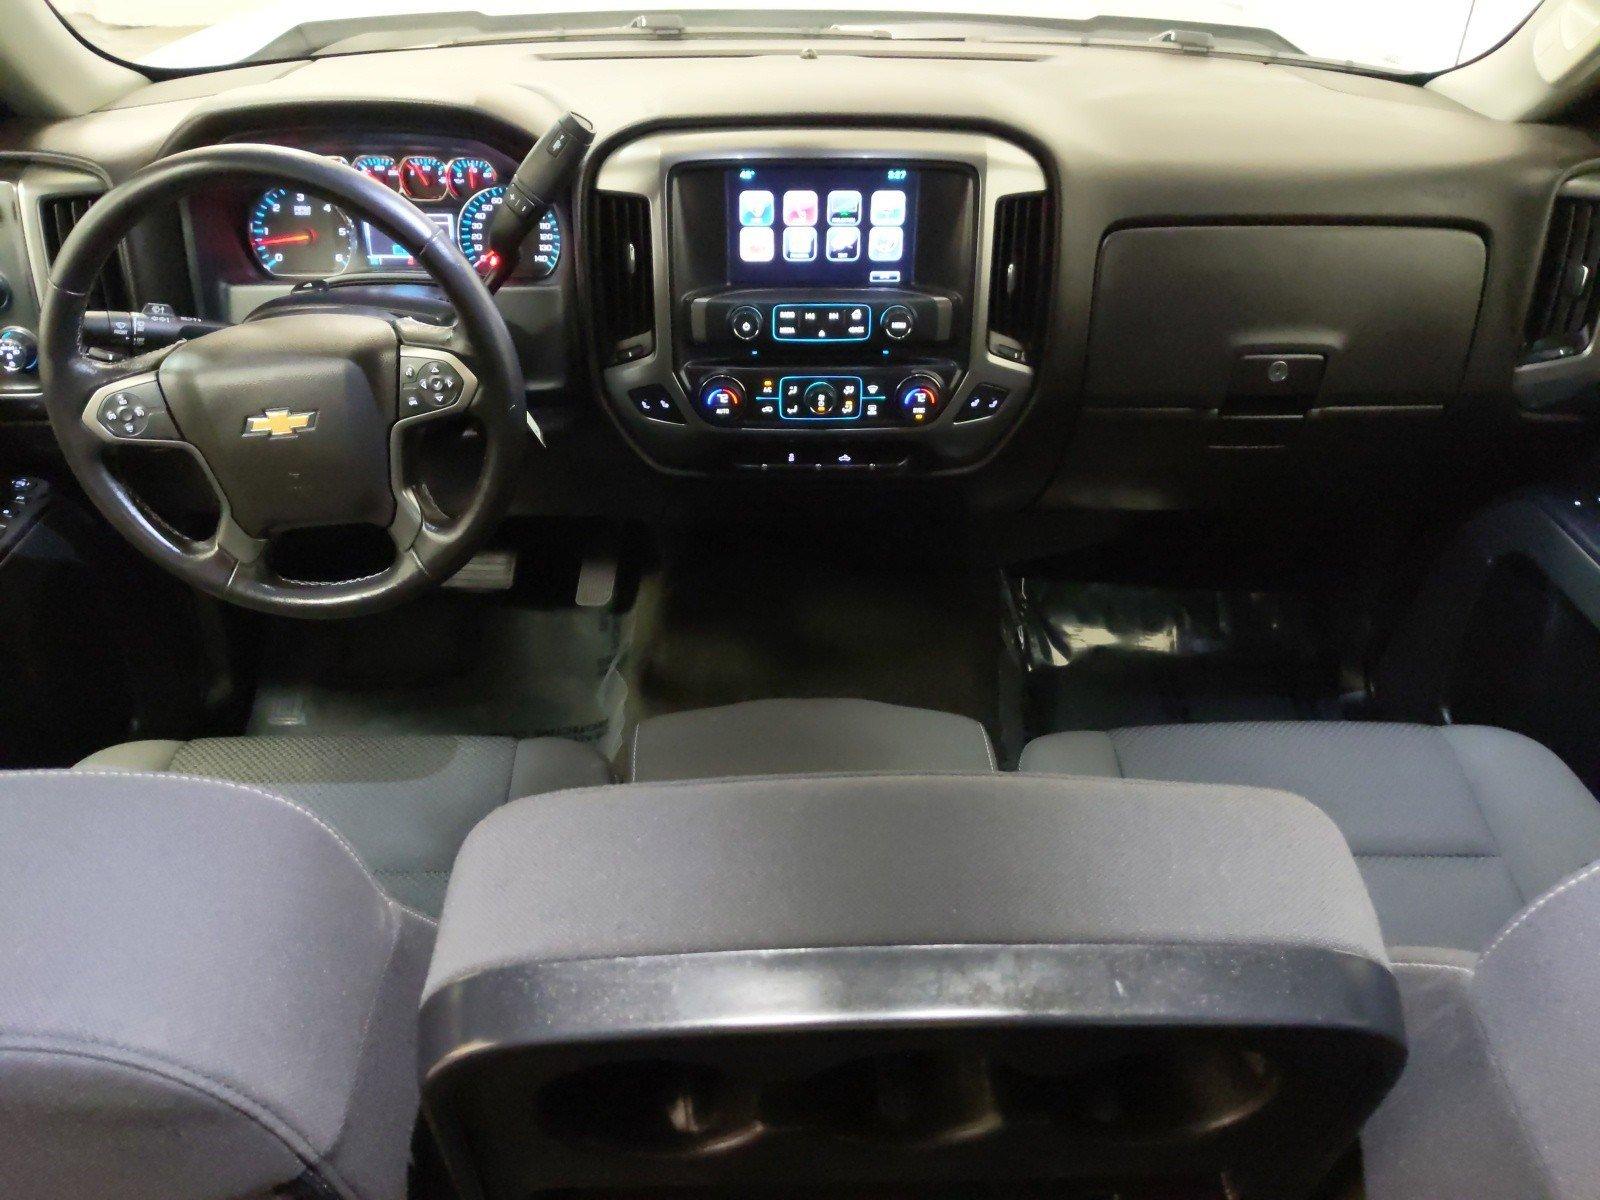 Used 2016 Chevrolet Silverado 1500 LT Extended Cab Pickup for sale in Lincoln NE